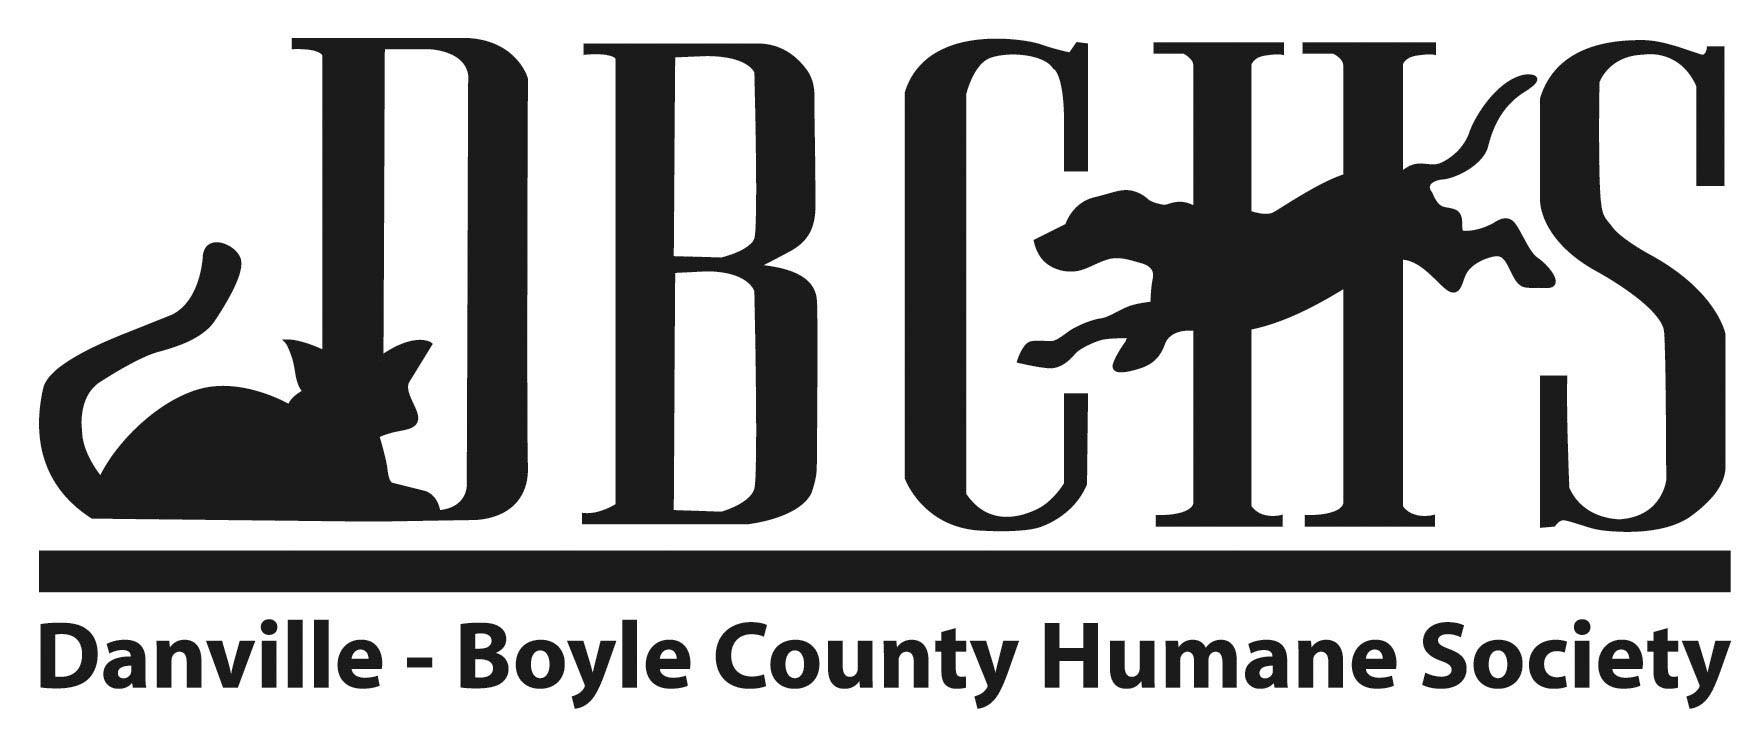 Home | Danville-Boyle County Humane Society